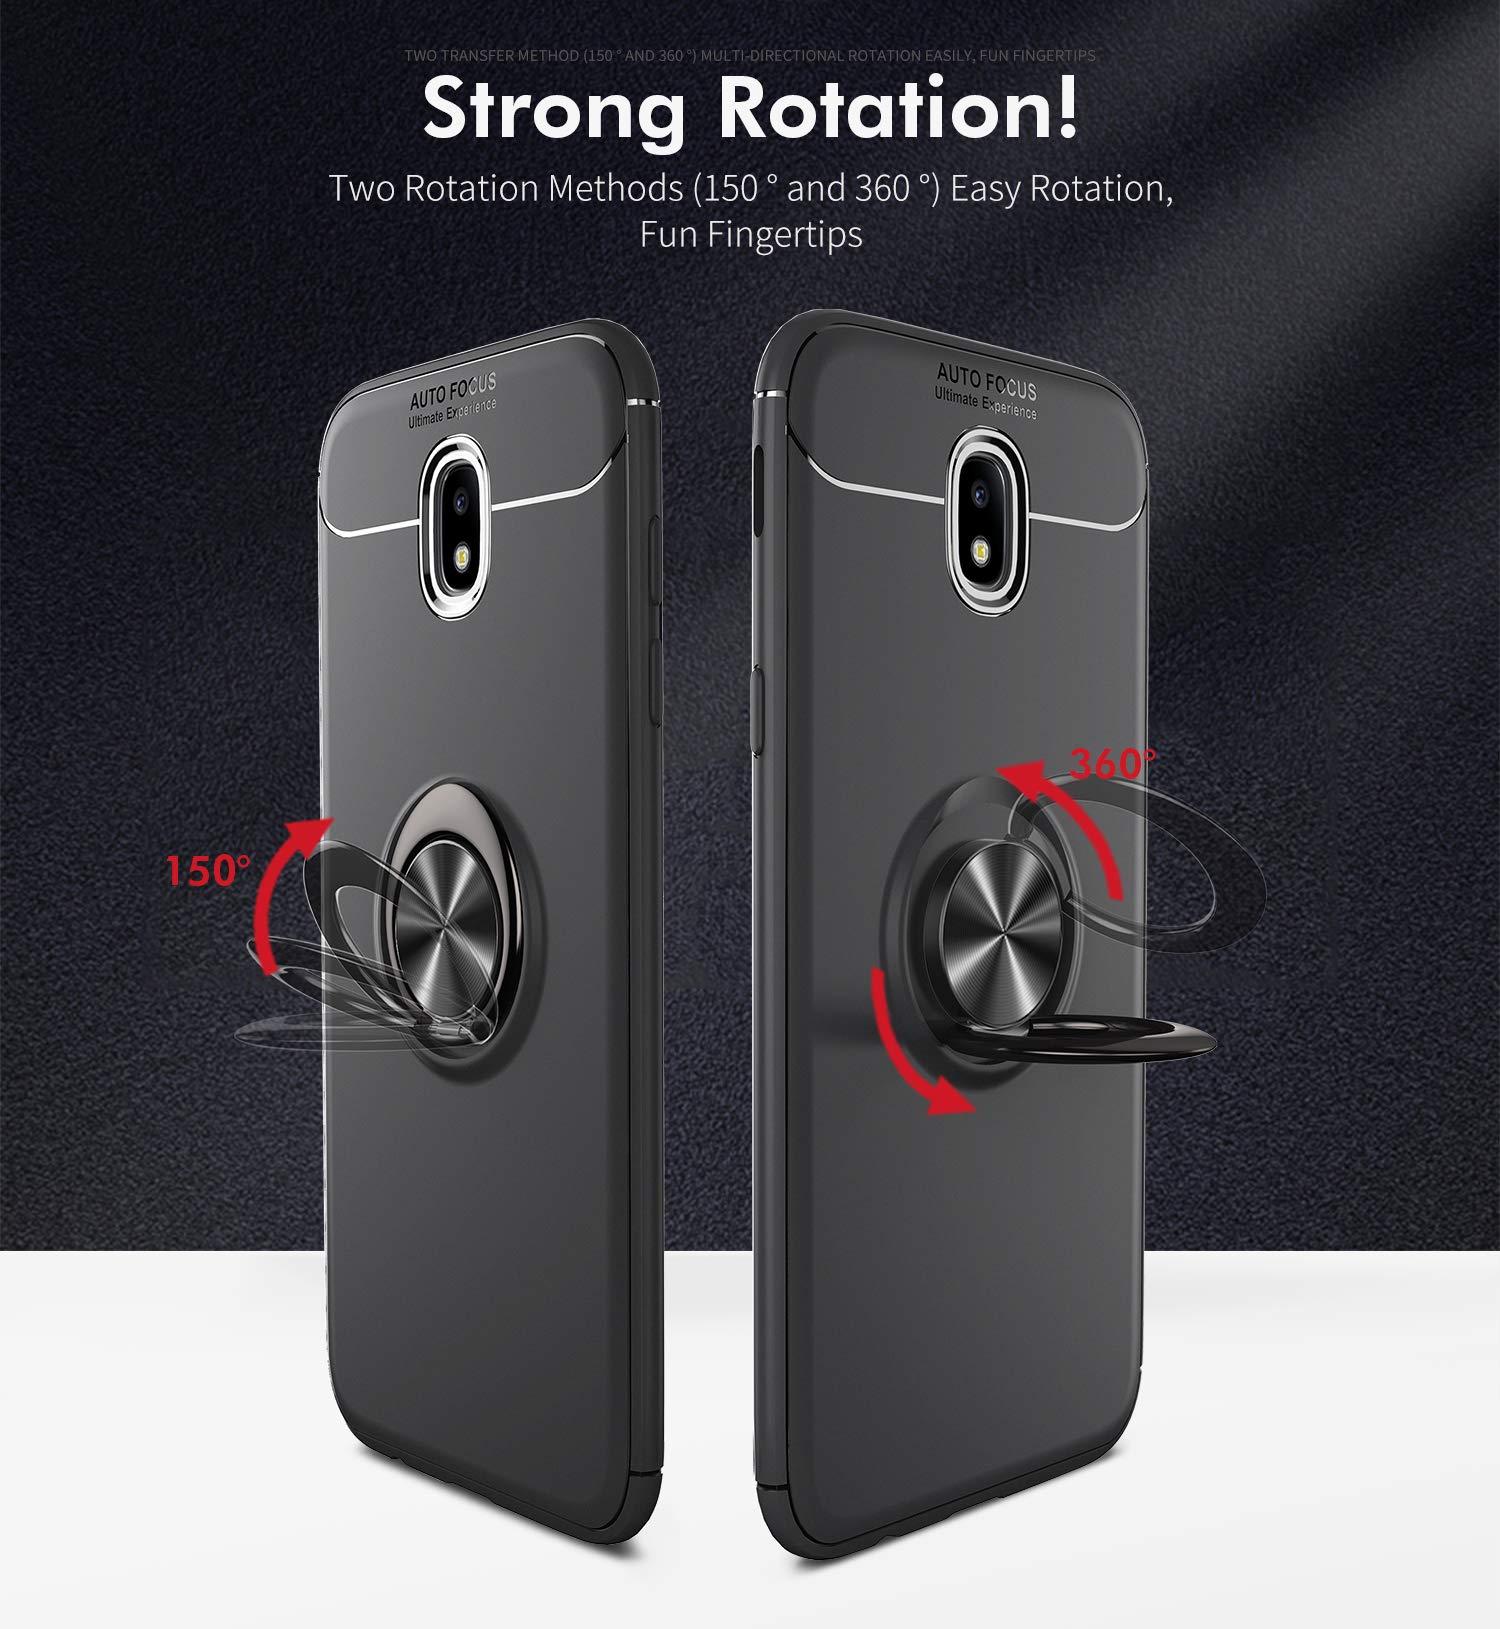 Samsung Galaxy J3 Prime Case,J3 Emerge Case LEECOCO Heavy Duty Tough Armor Box Dual Layer Hybrid Hard PC and Soft TPU Shockproof Defender Case for Samsung Galaxy J3 2017 Heavy Orange